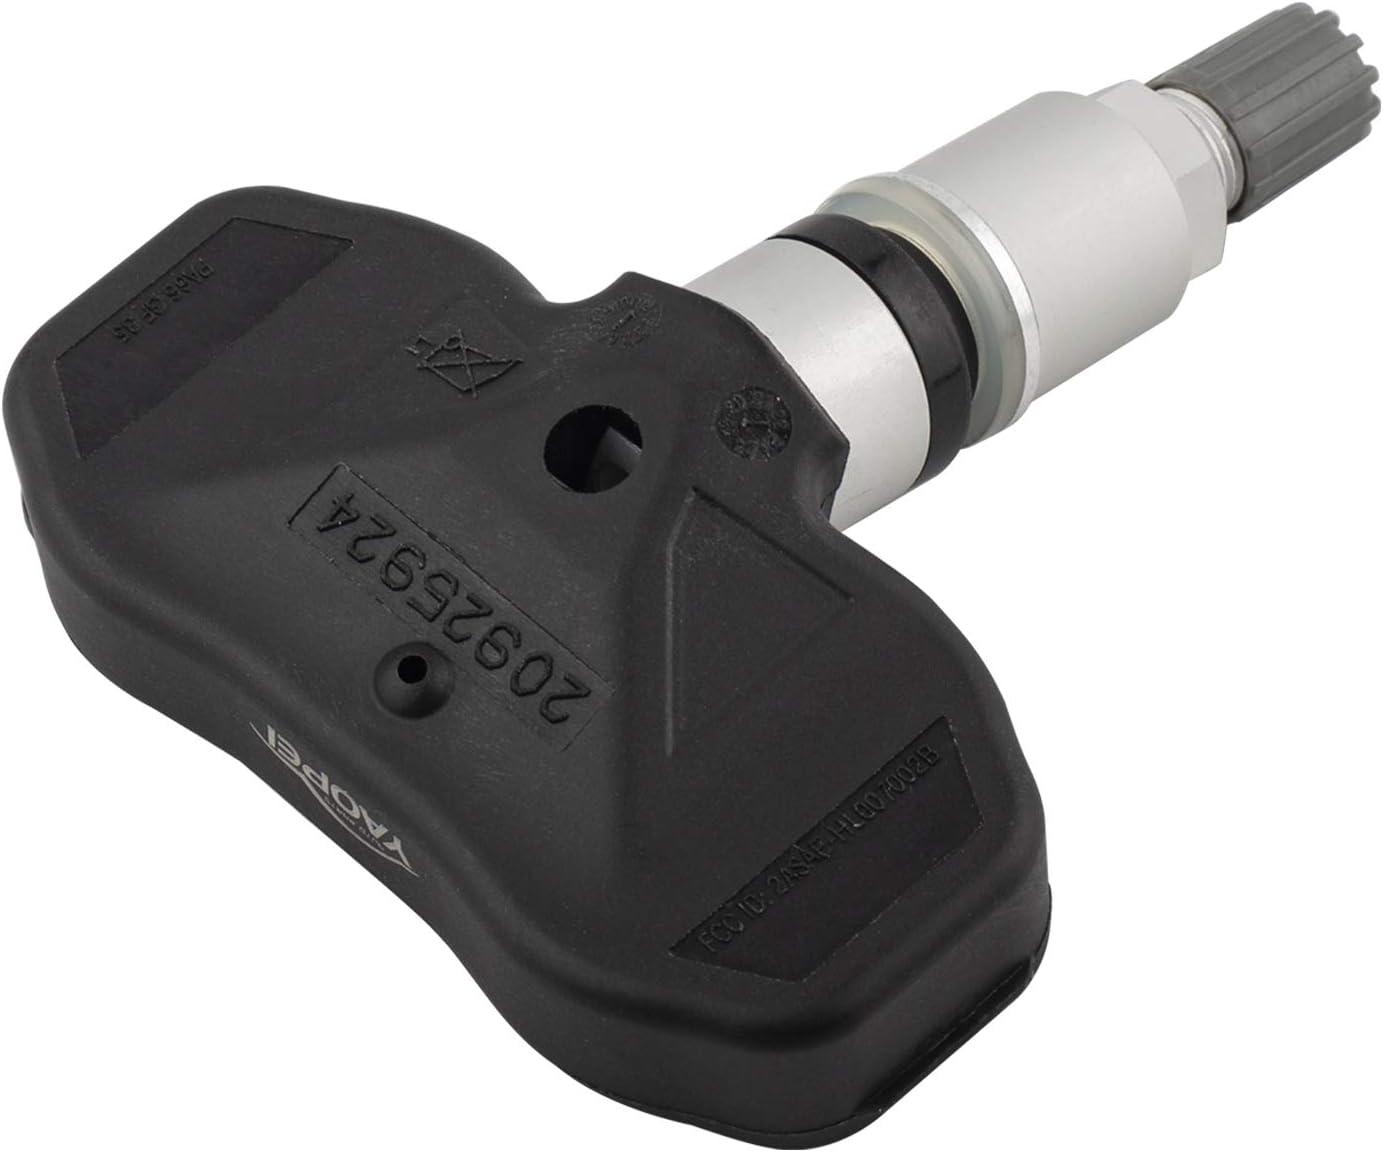 YAOPEI 20925924 TPMS Sensors,Car Tire Pressure Monitoring System 315MHz for Chevrolet Corvette HHR Buick Lacrosse Pontiac Torrent Saturn Outlook 15234846